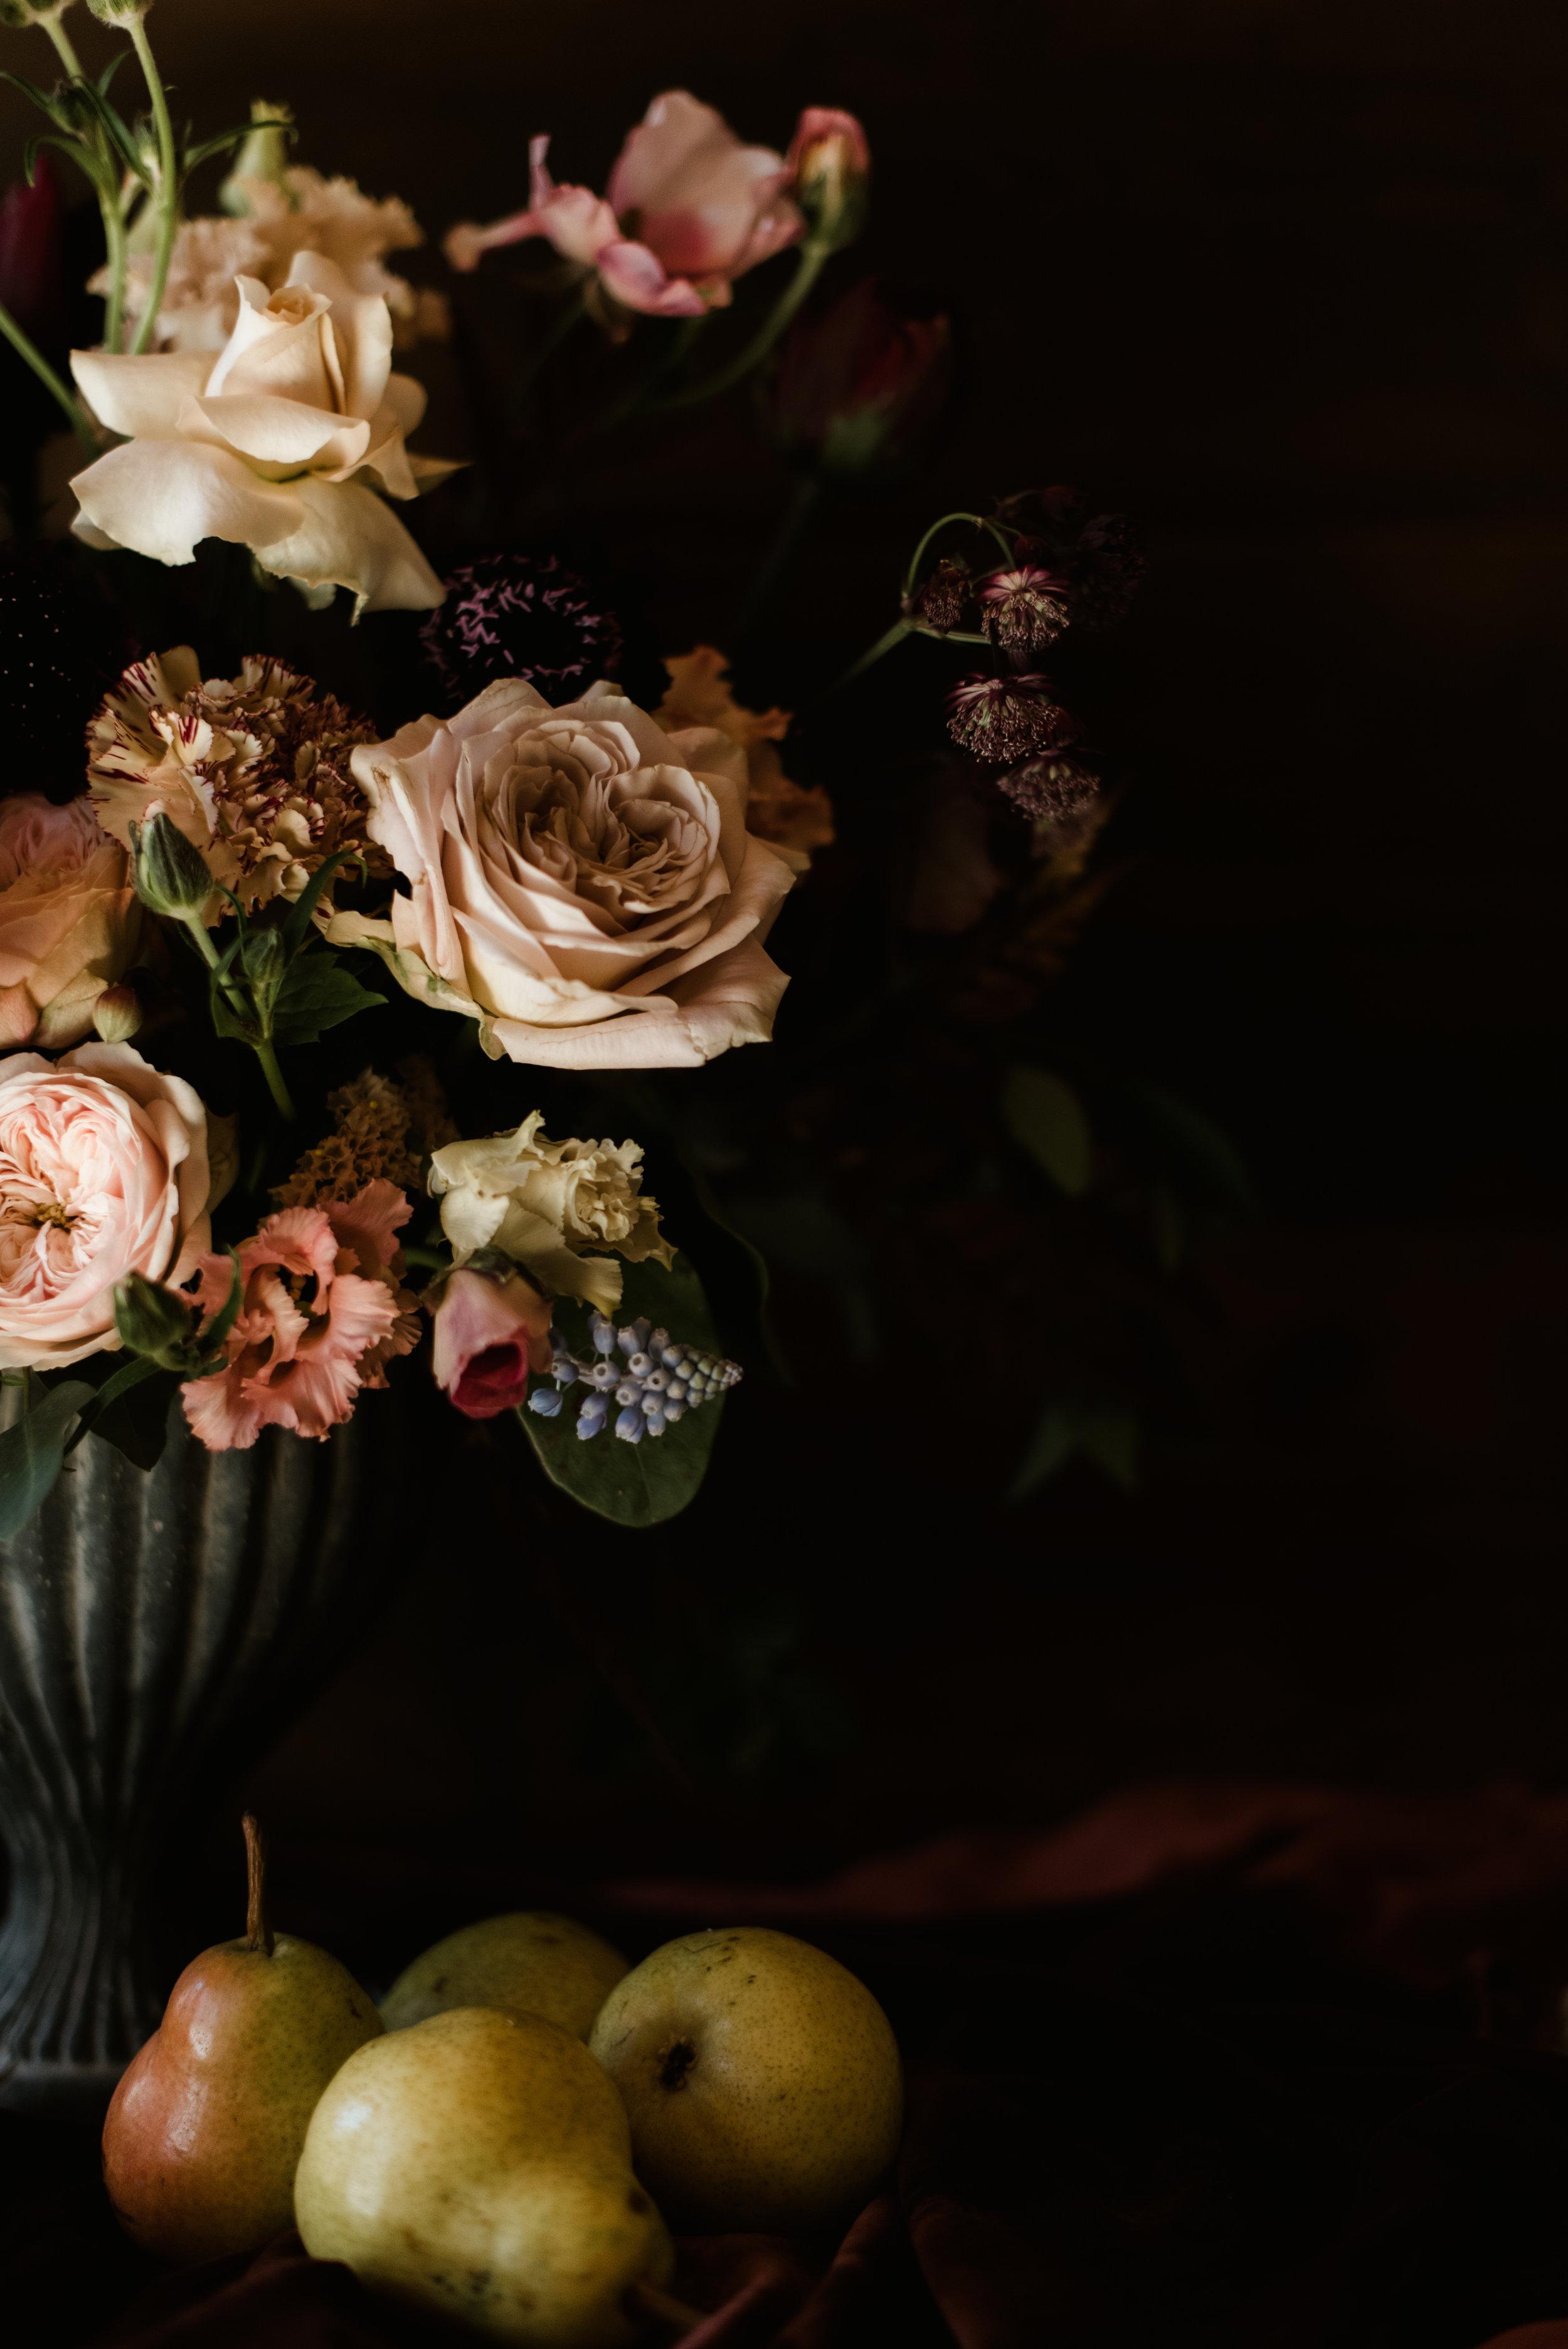 DarkRomance-GHphoto-14.jpg